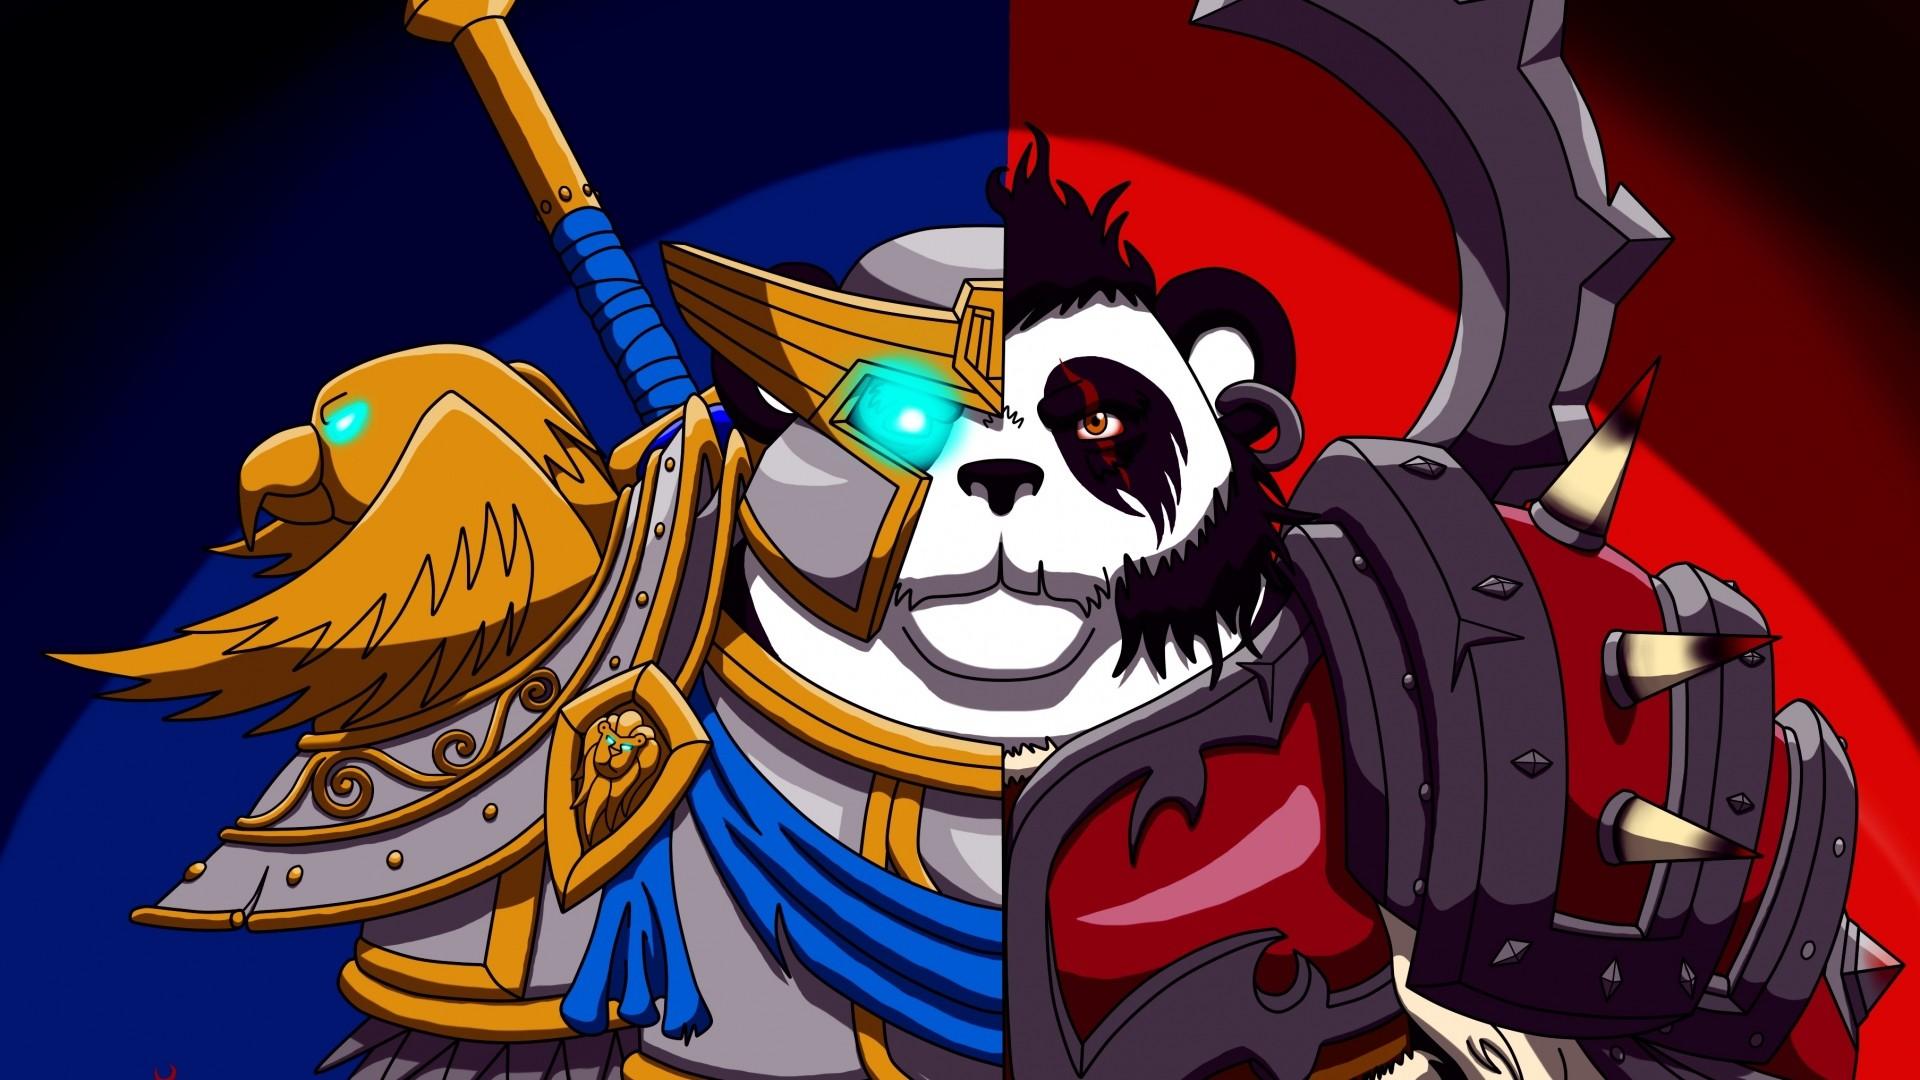 Wallpaper world of warcraft, wow, alliance and horde, panda